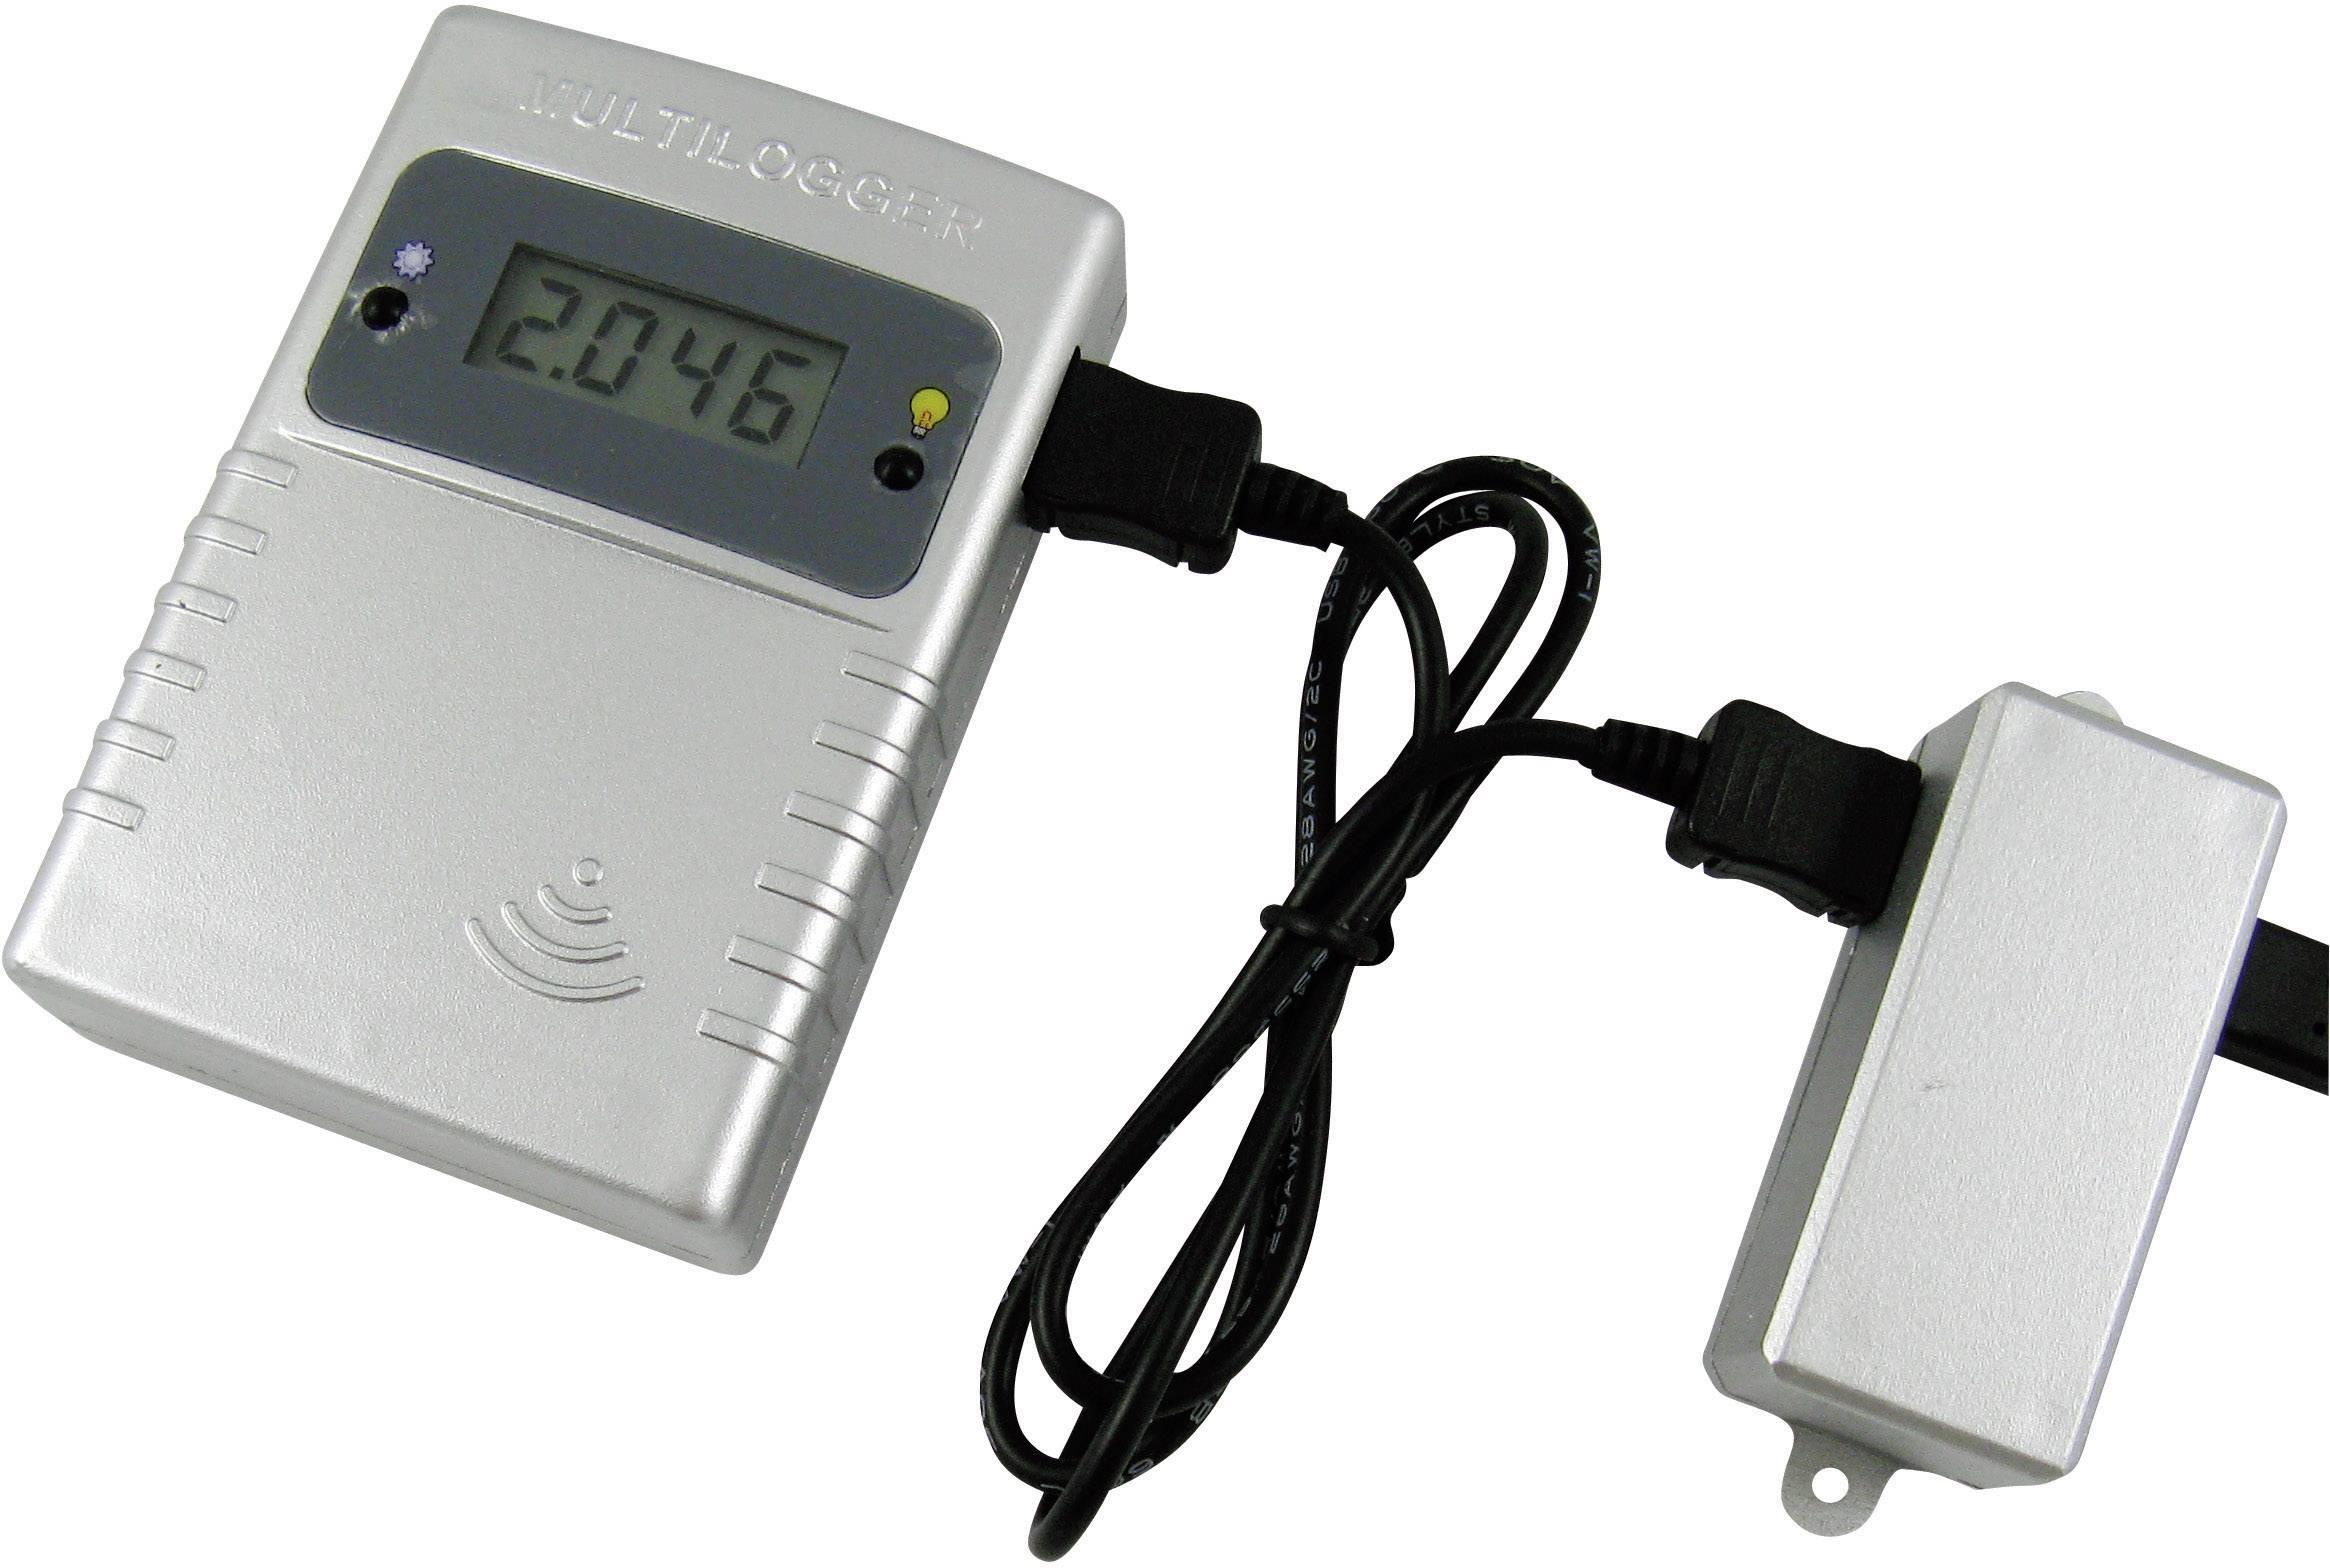 Teplotný datalogger Arexx PRO-88msn, 0 - 2,046 V/DC